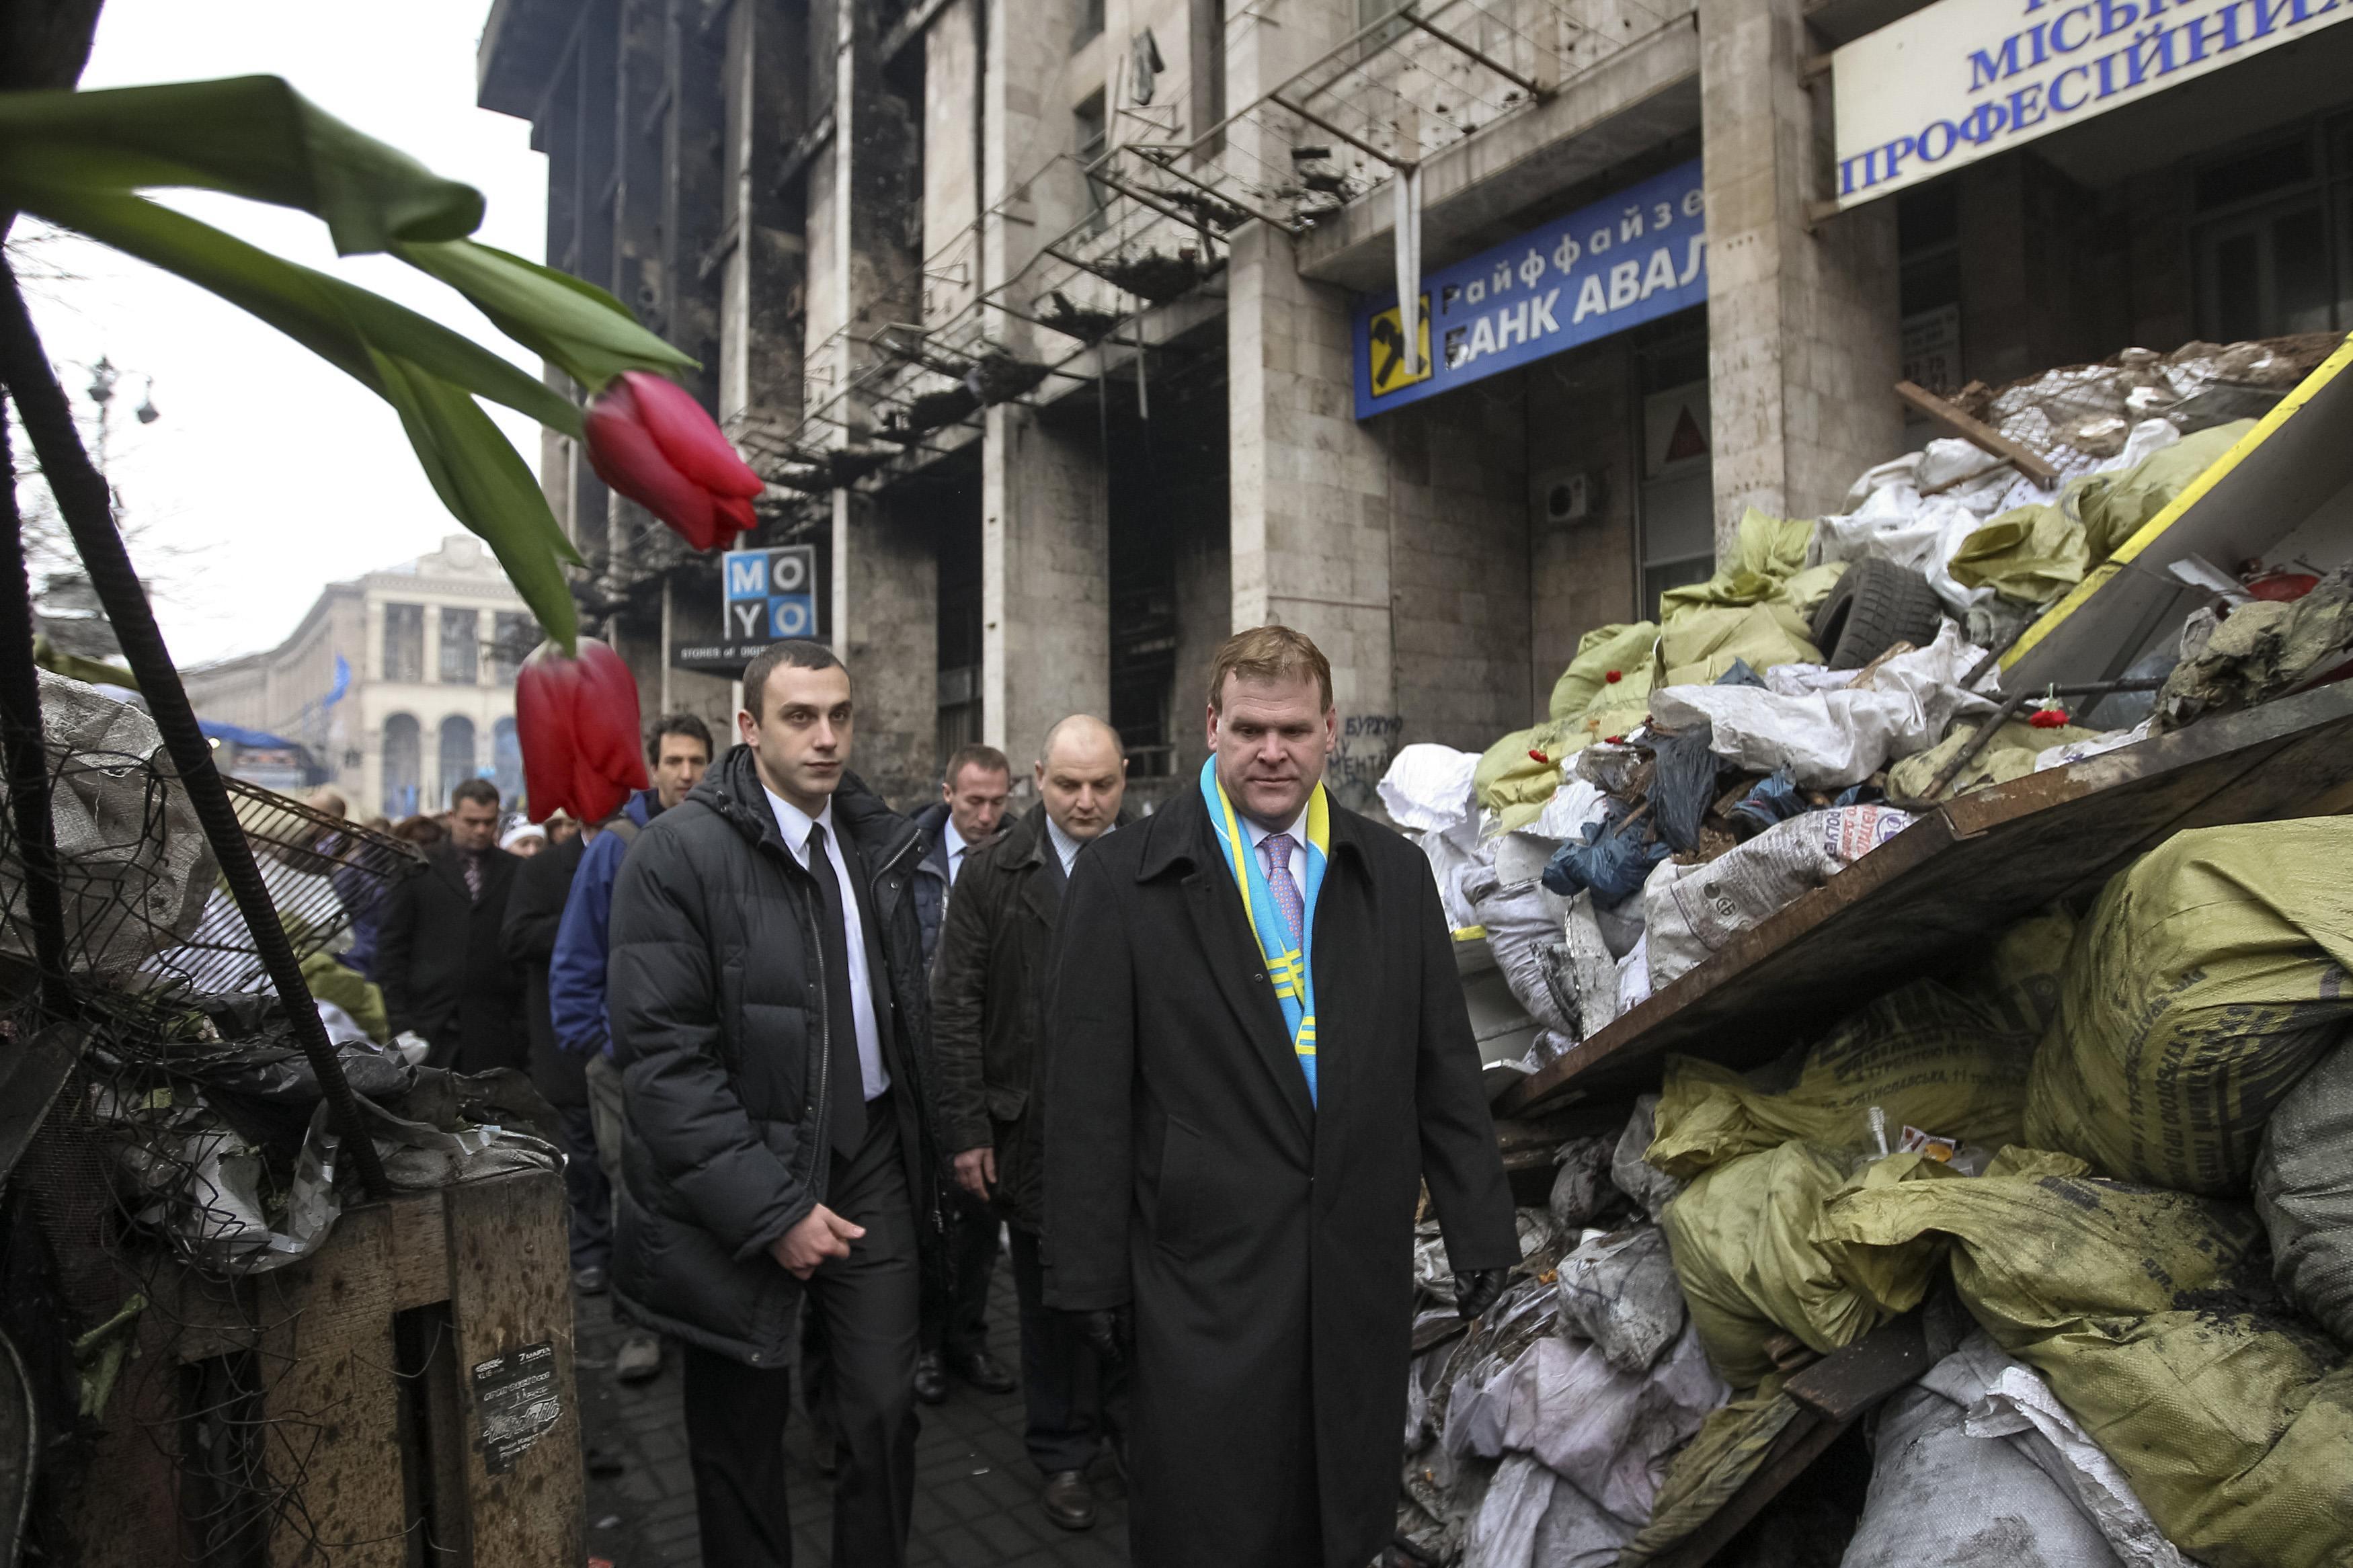 Дом профсоюзов и баррикады на Крещатике